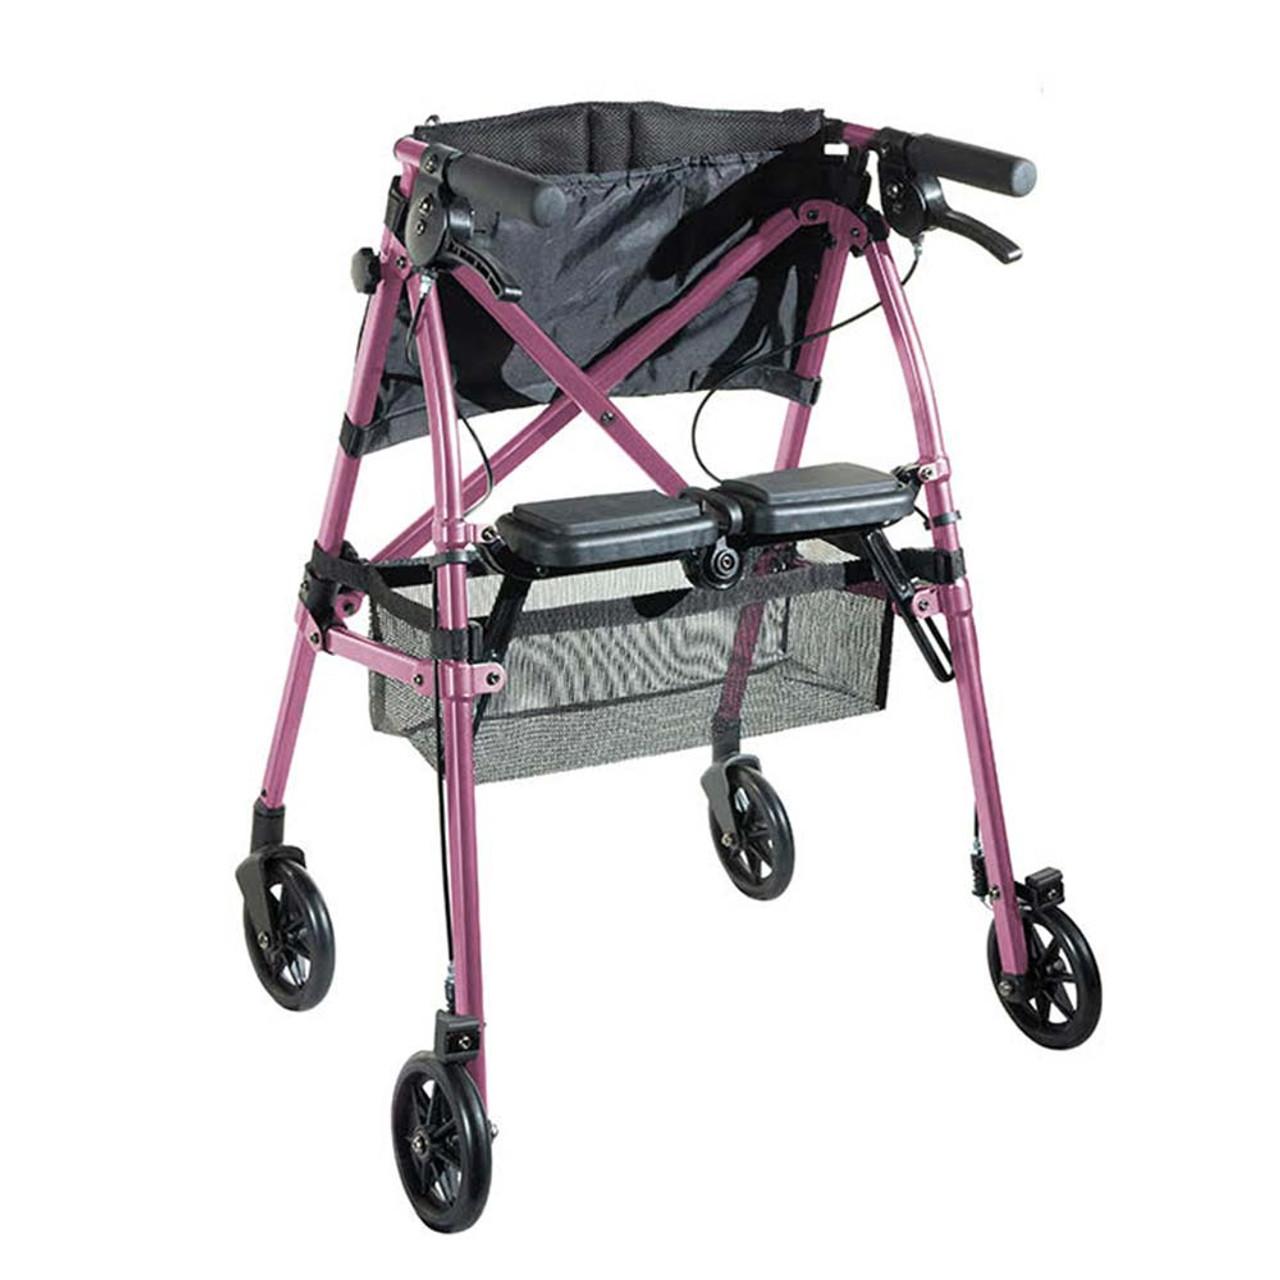 Portable Folding Mobility Walker MWPFL1  Open Back View Pink